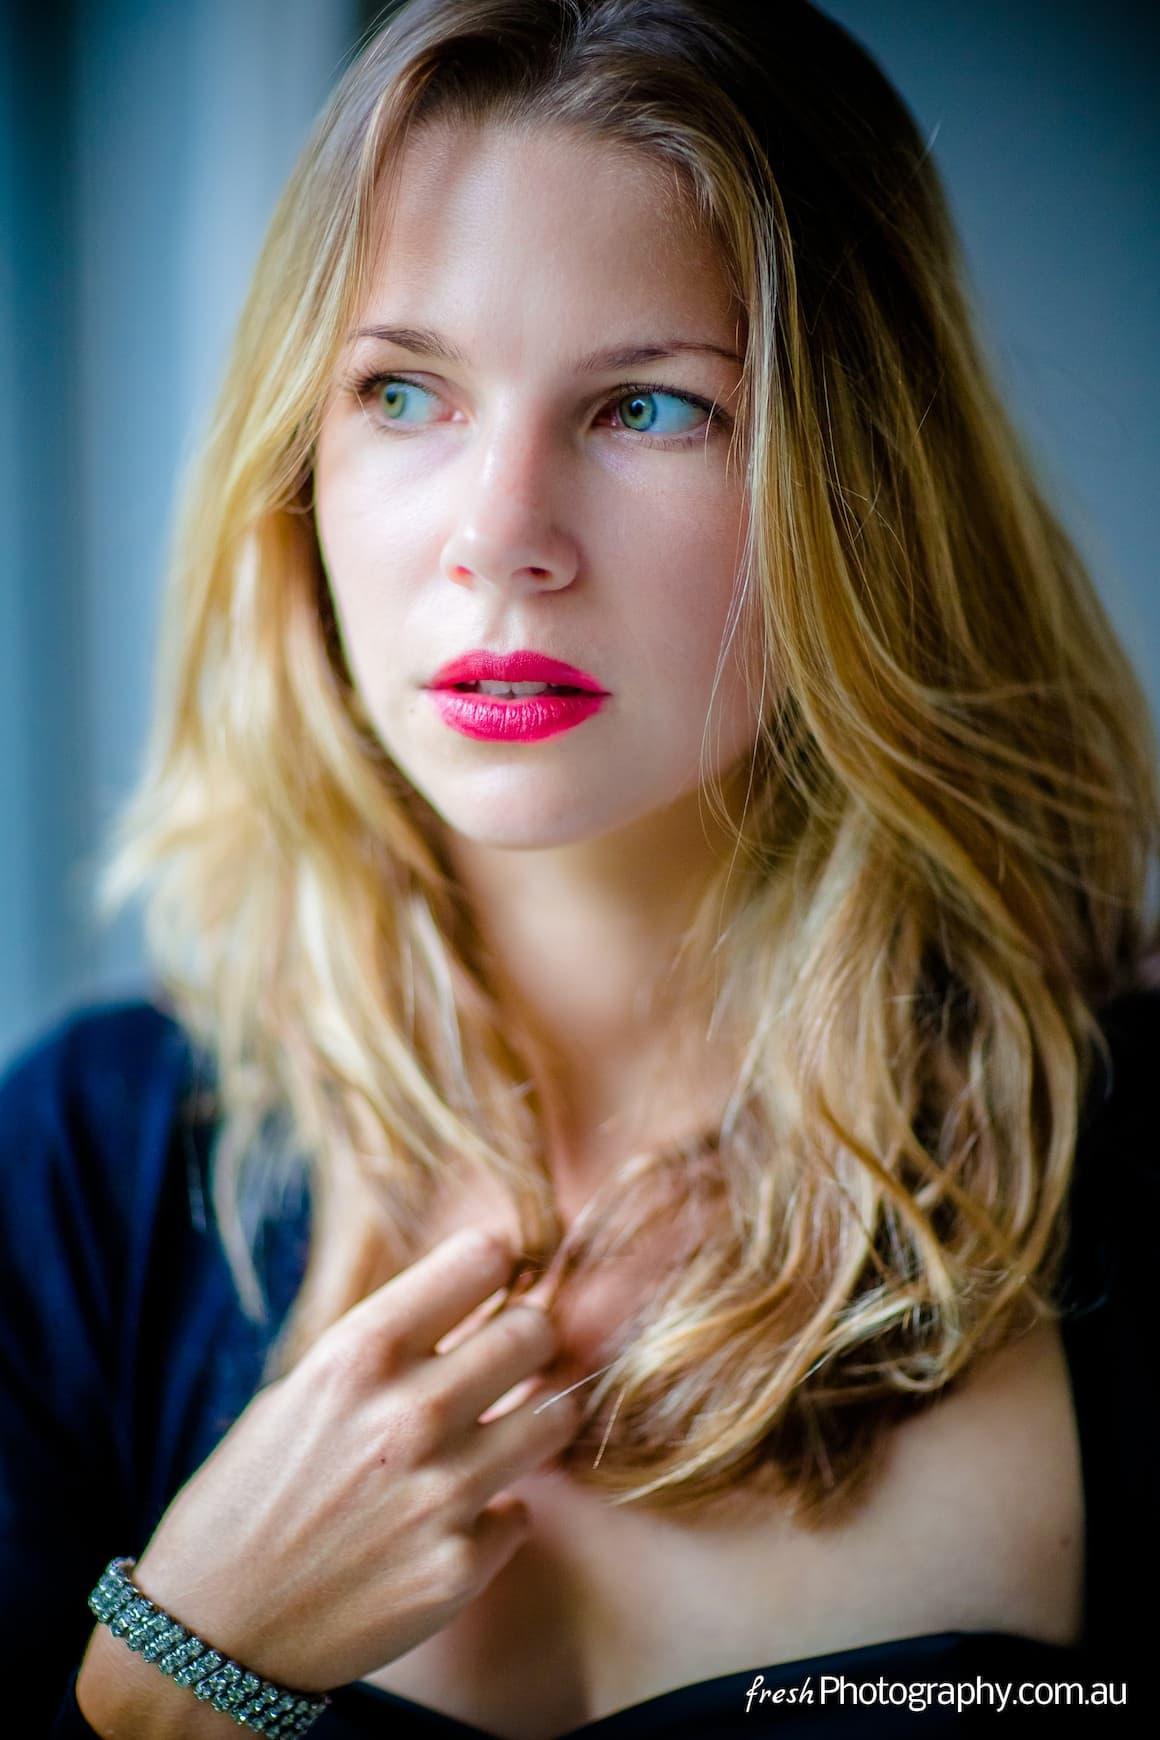 amazing portraits - head shots